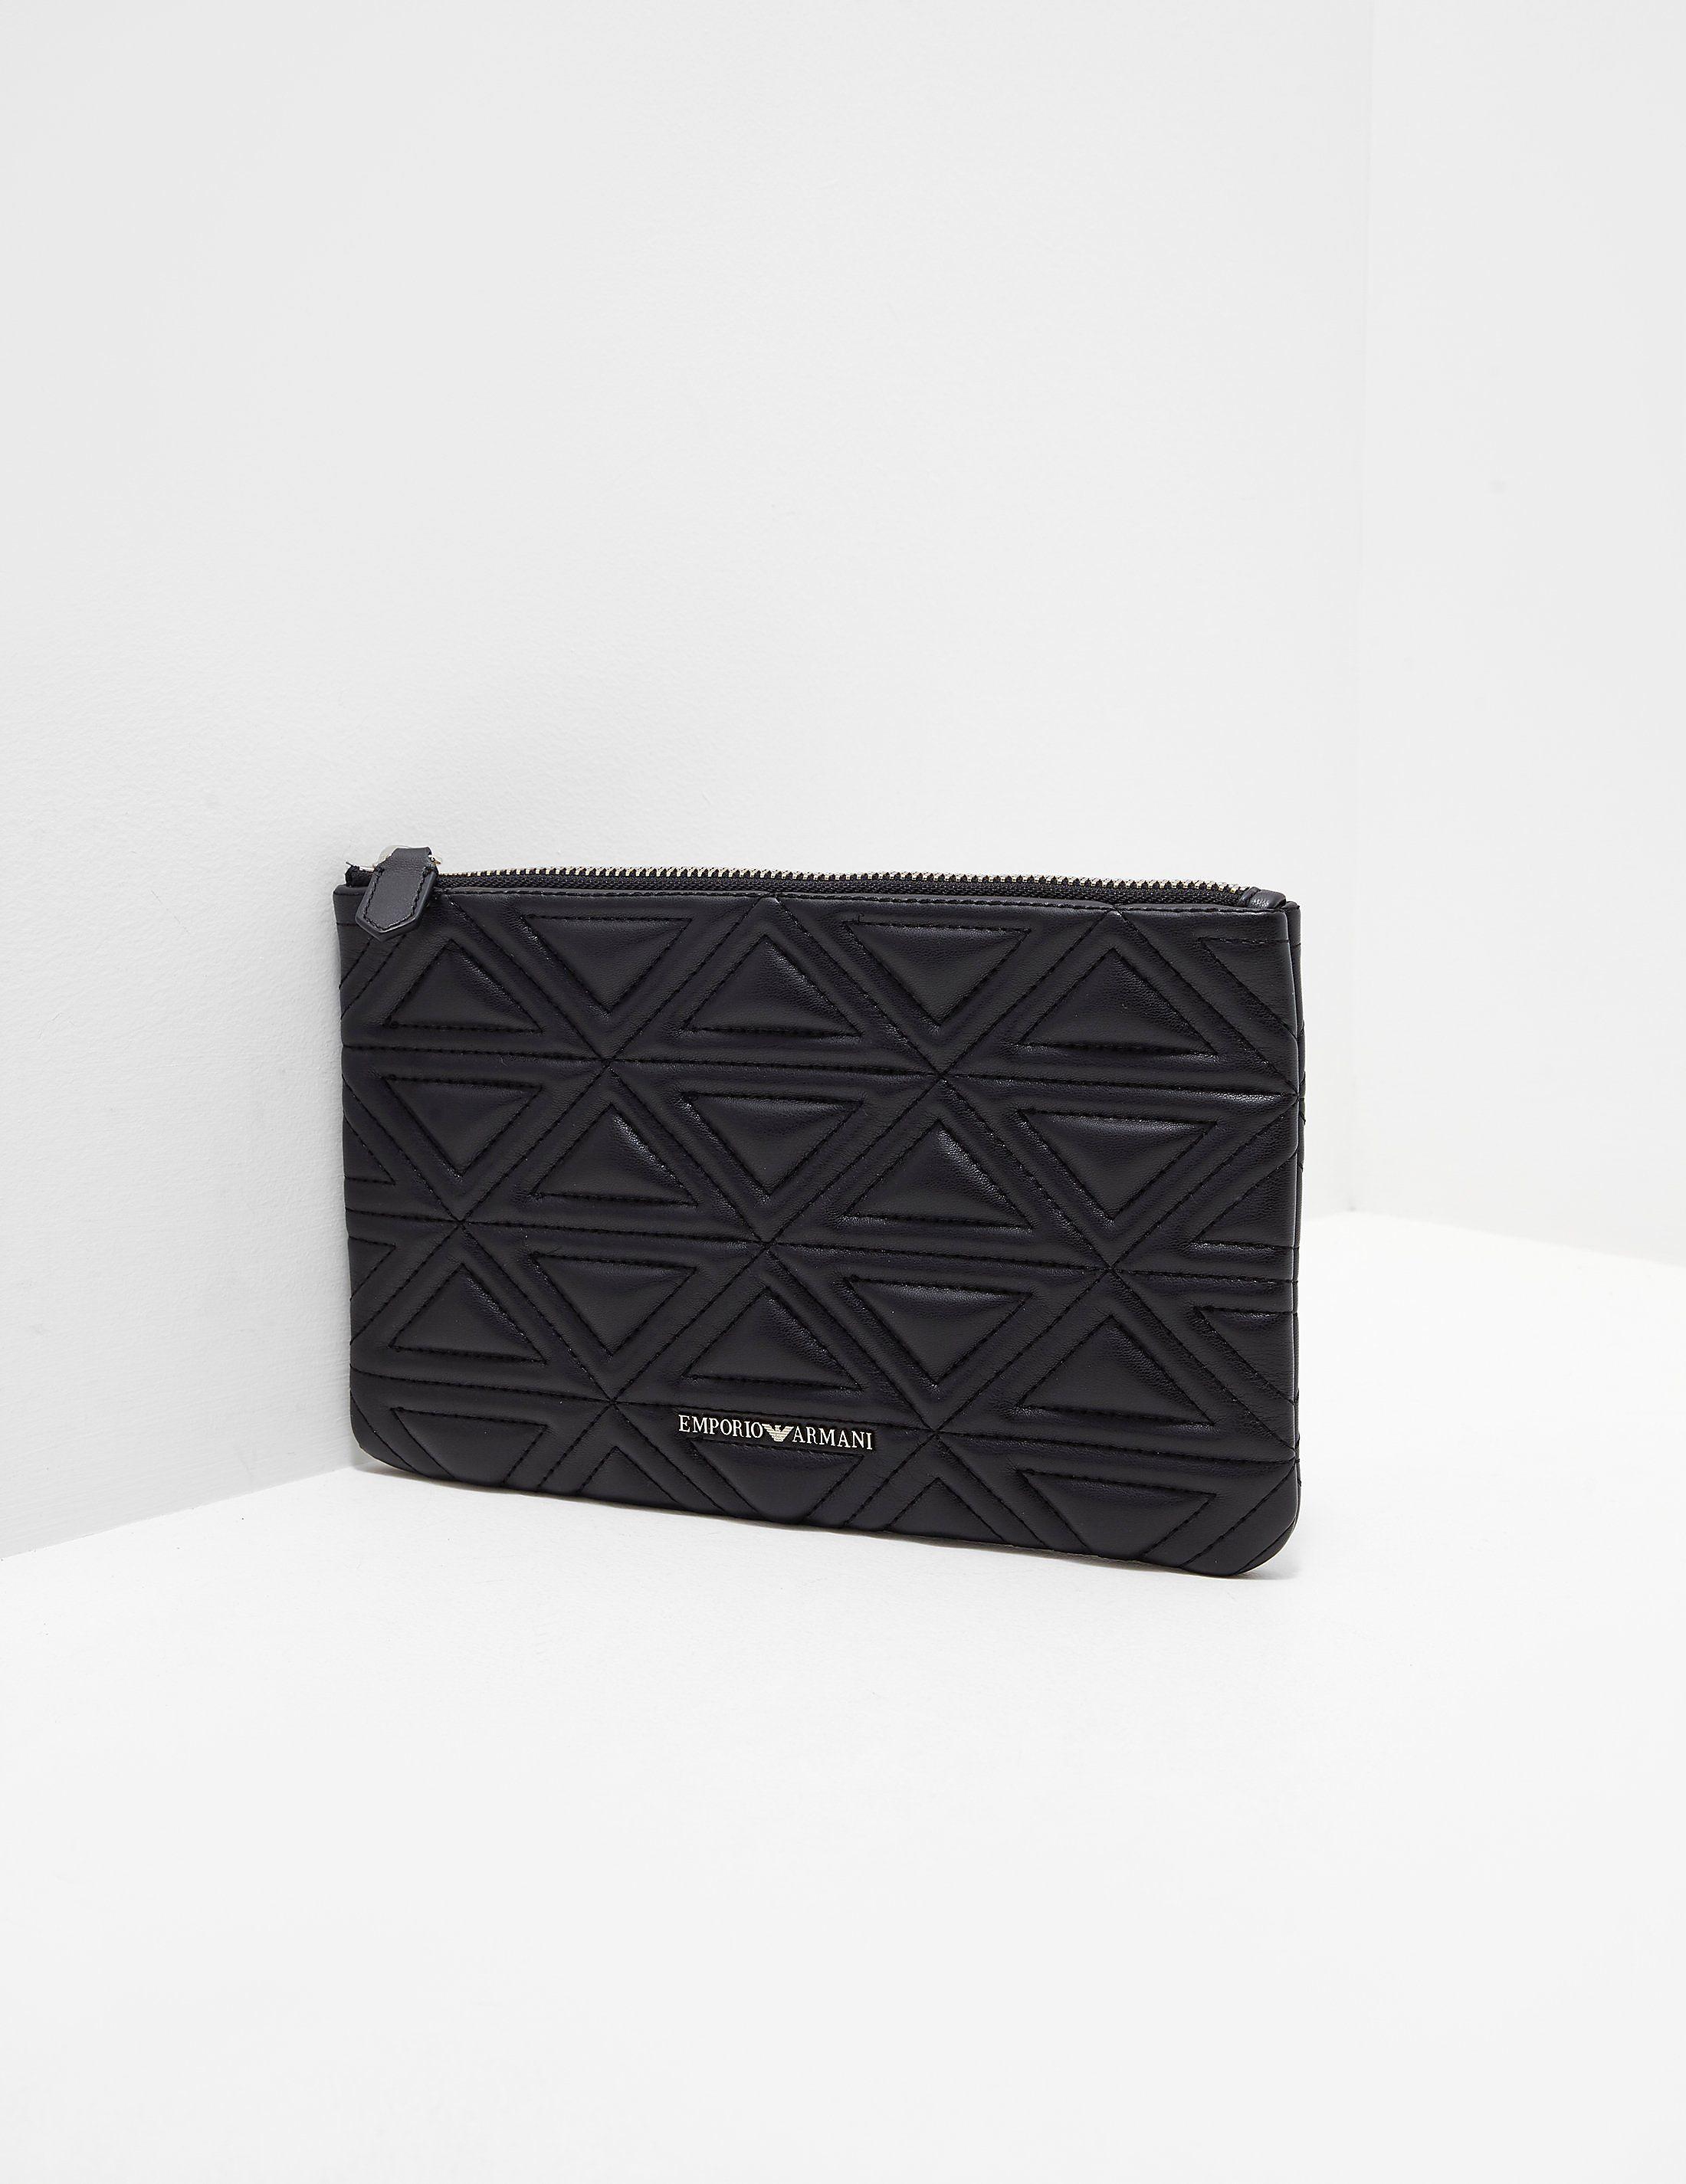 Emporio Armani Quilted Clutch Bag  2844f8157759e